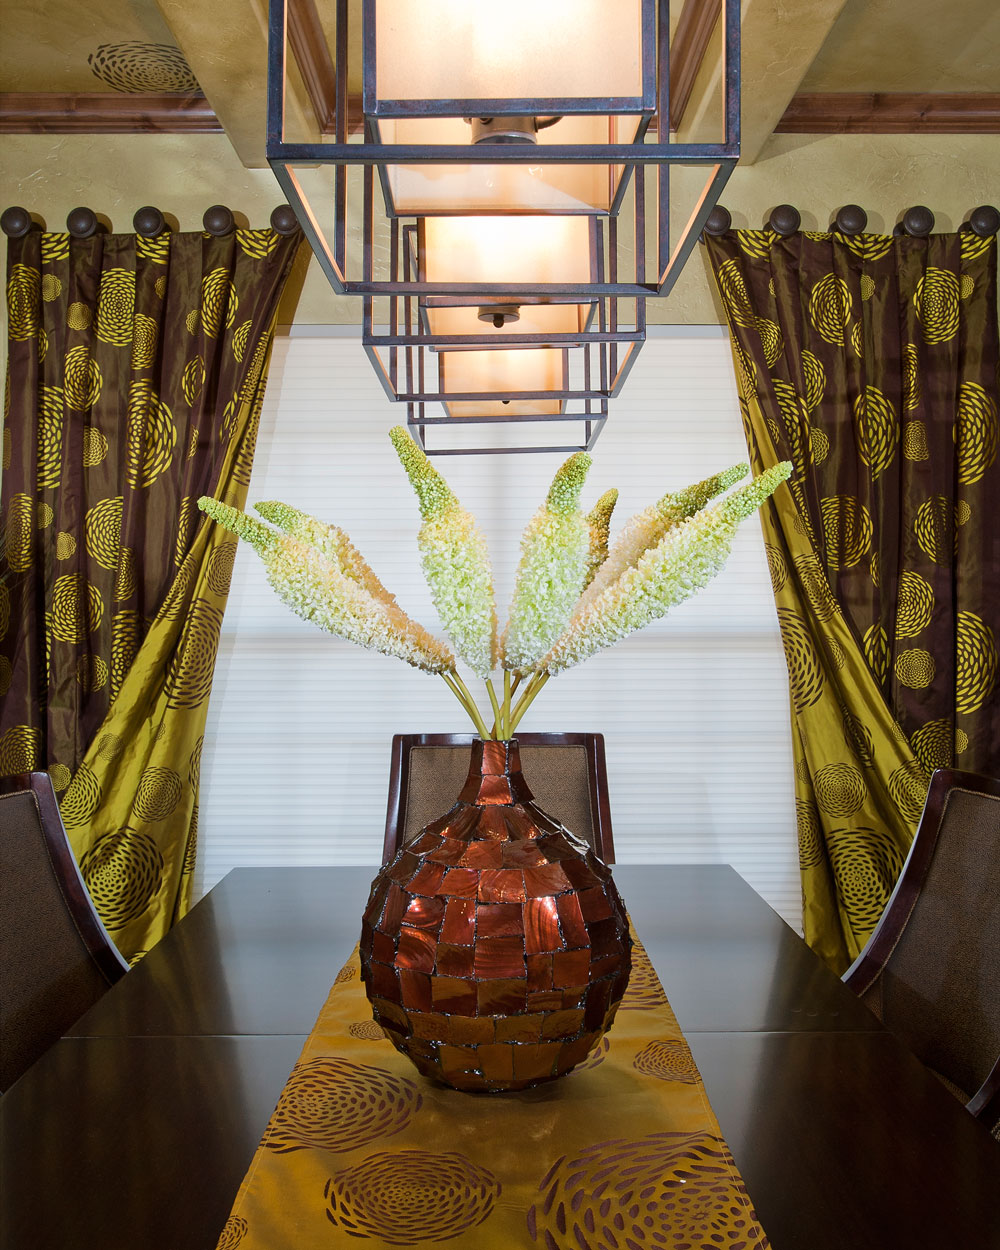 furniture-drapery-colorad-springs-interior-design.jpg